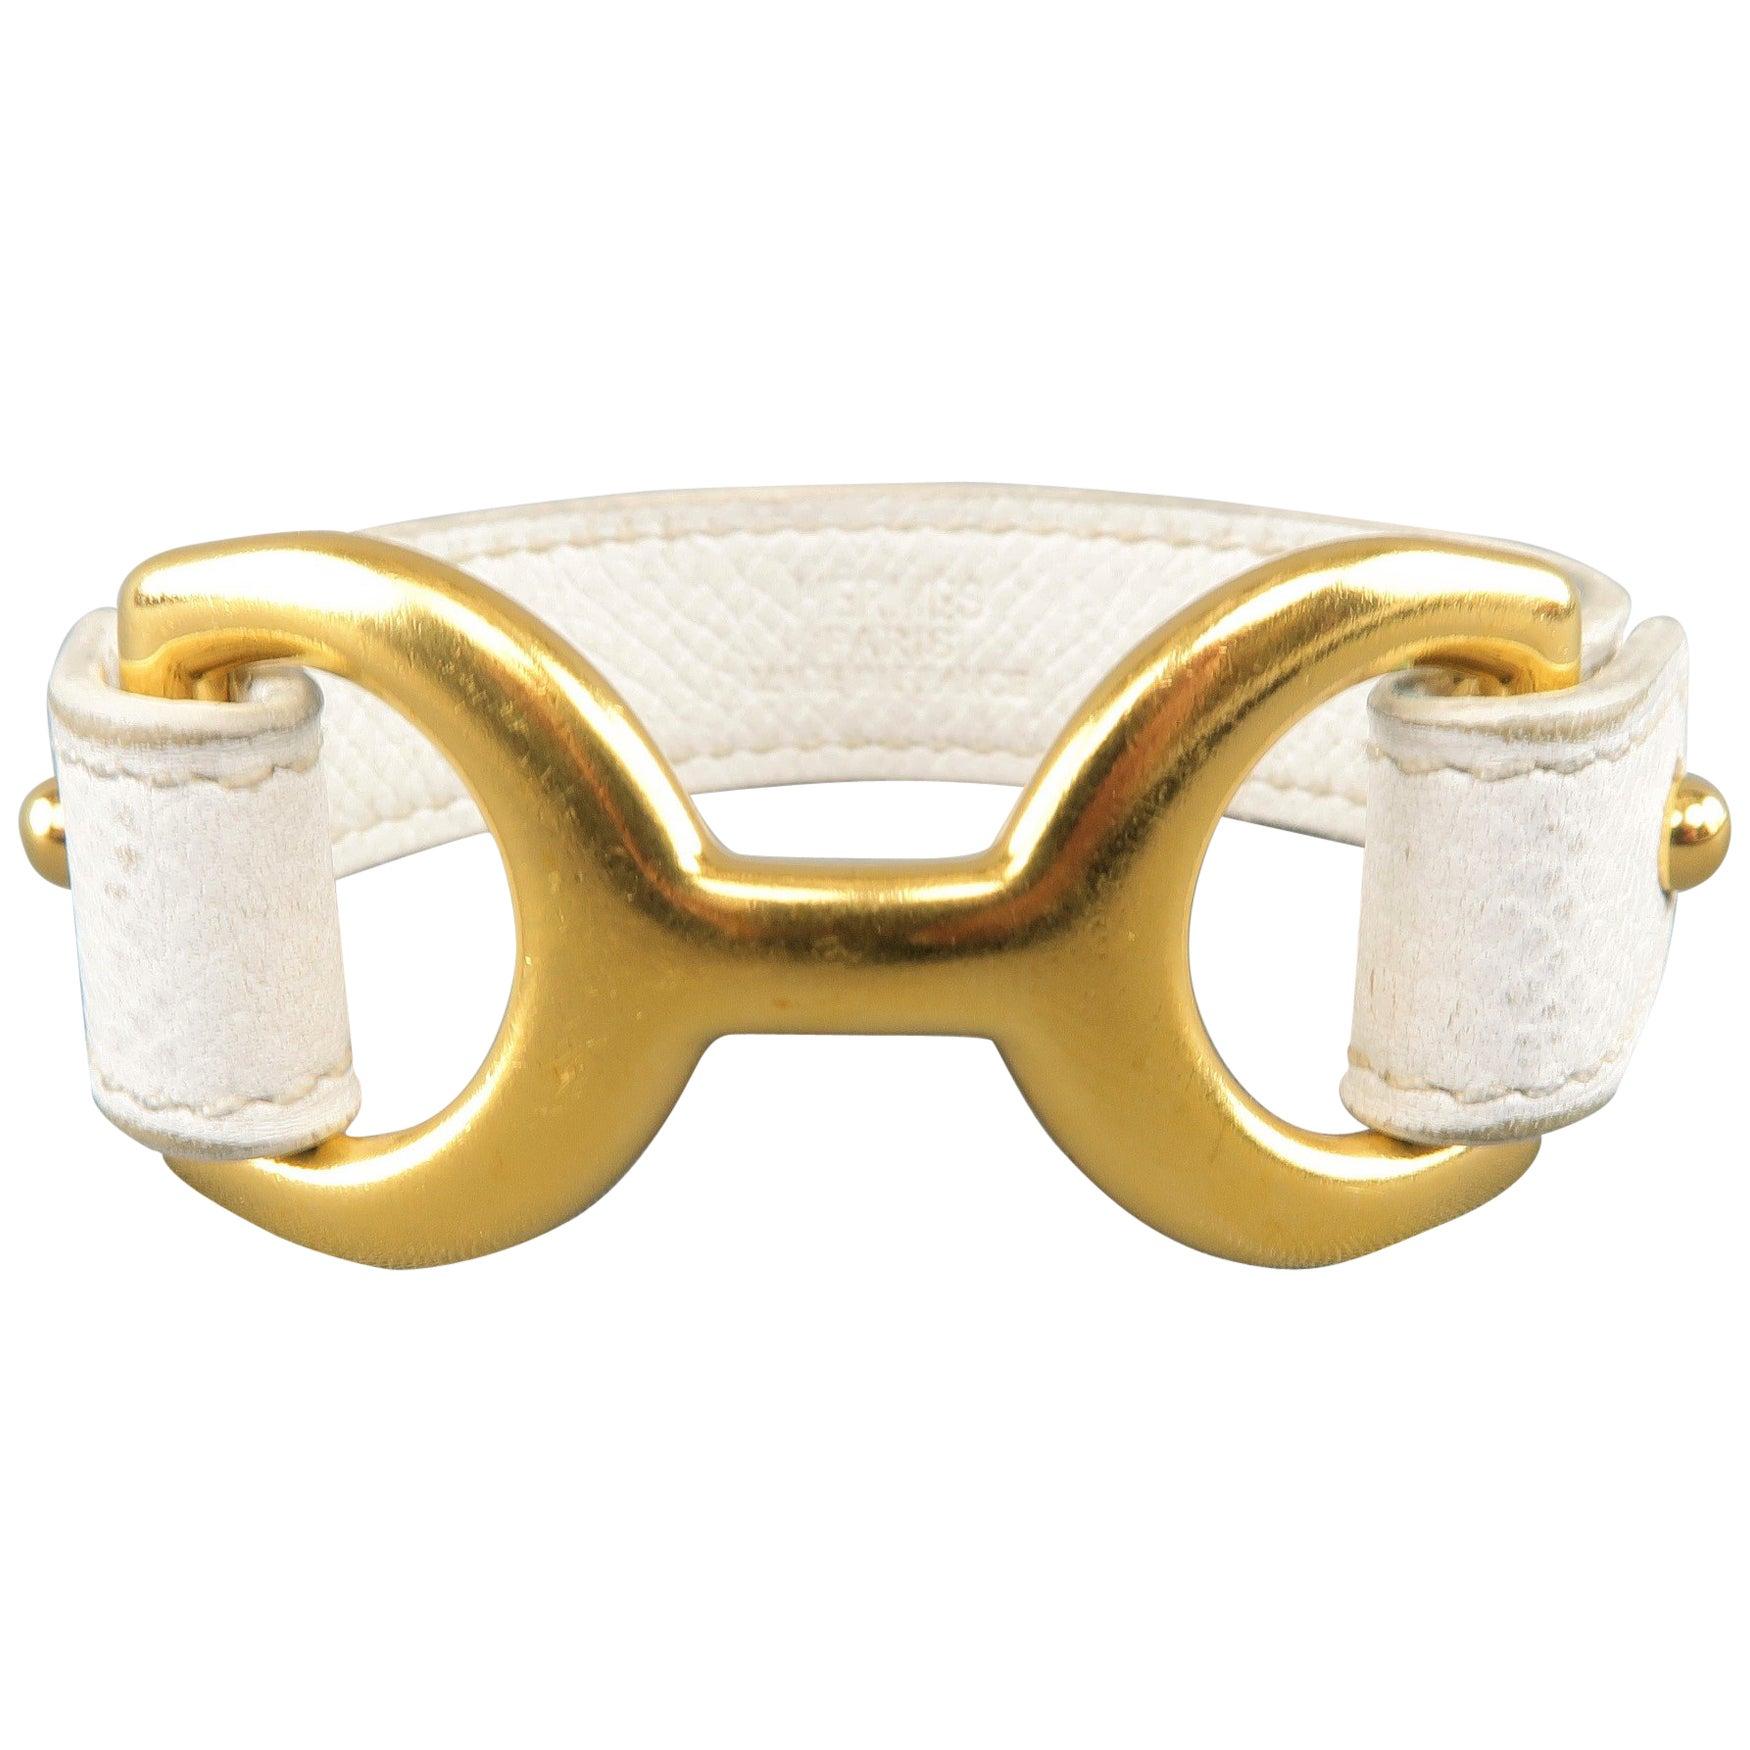 Hermes Bracelet Off White Epson Leather Gold Chamonix Pavane Cuff Jewelry At 1stdibs